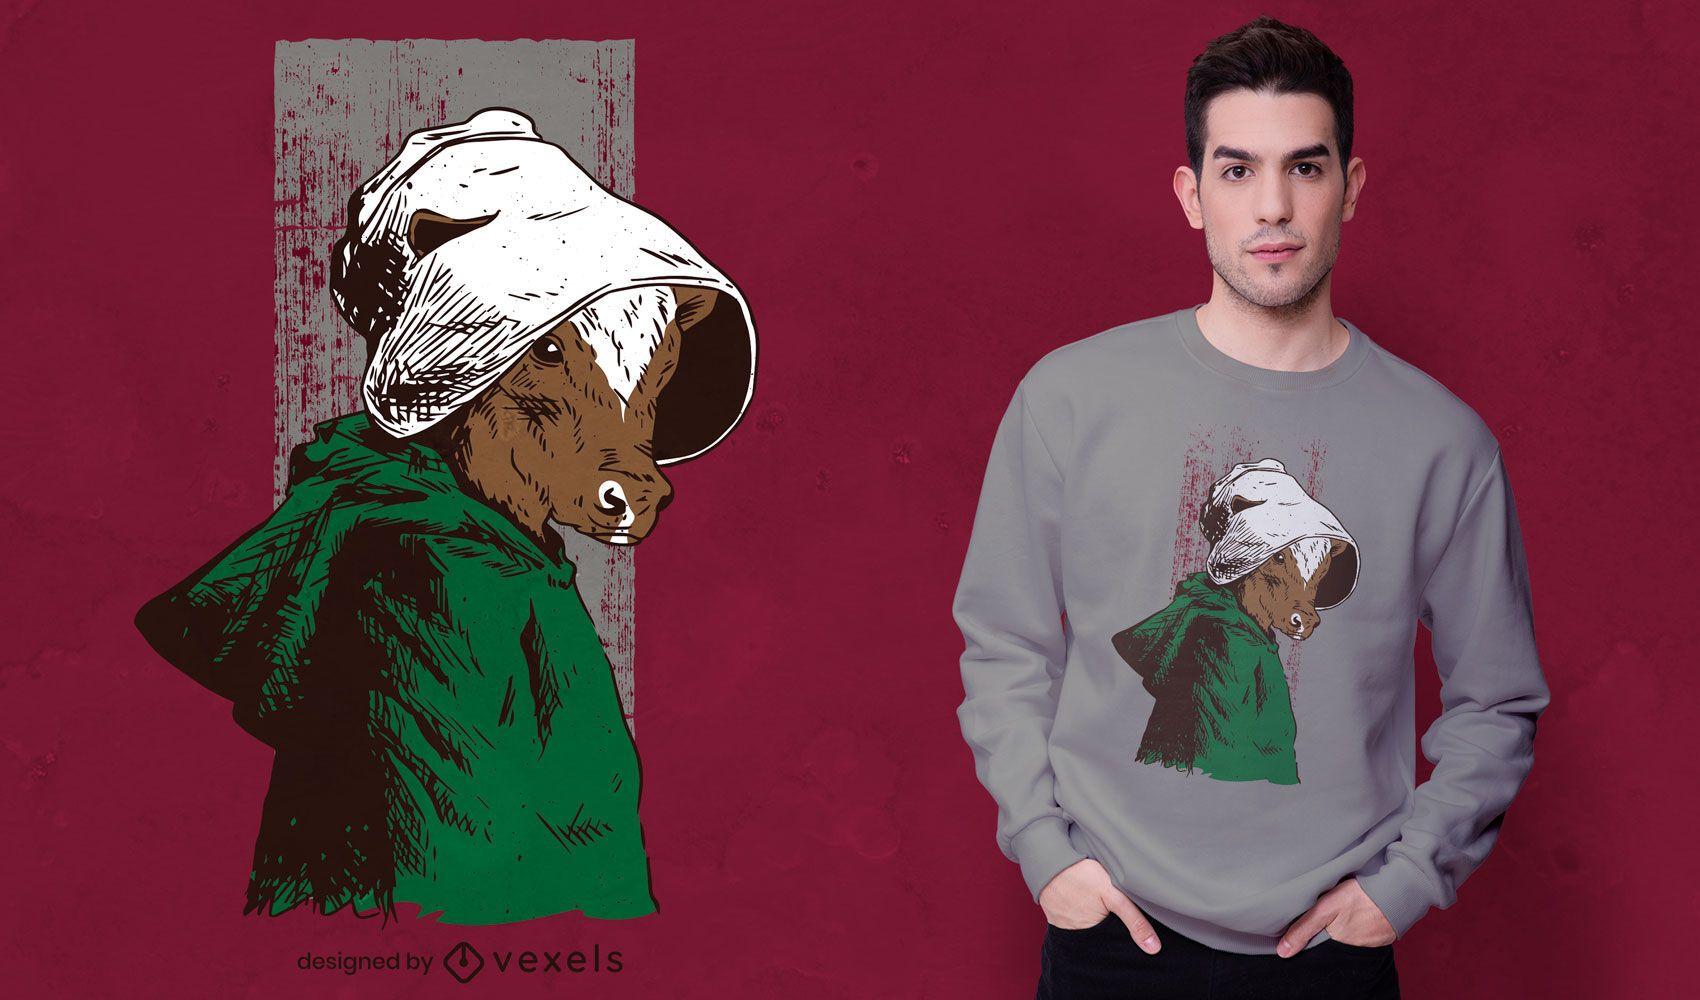 Handmaid cow parody t-shirt design